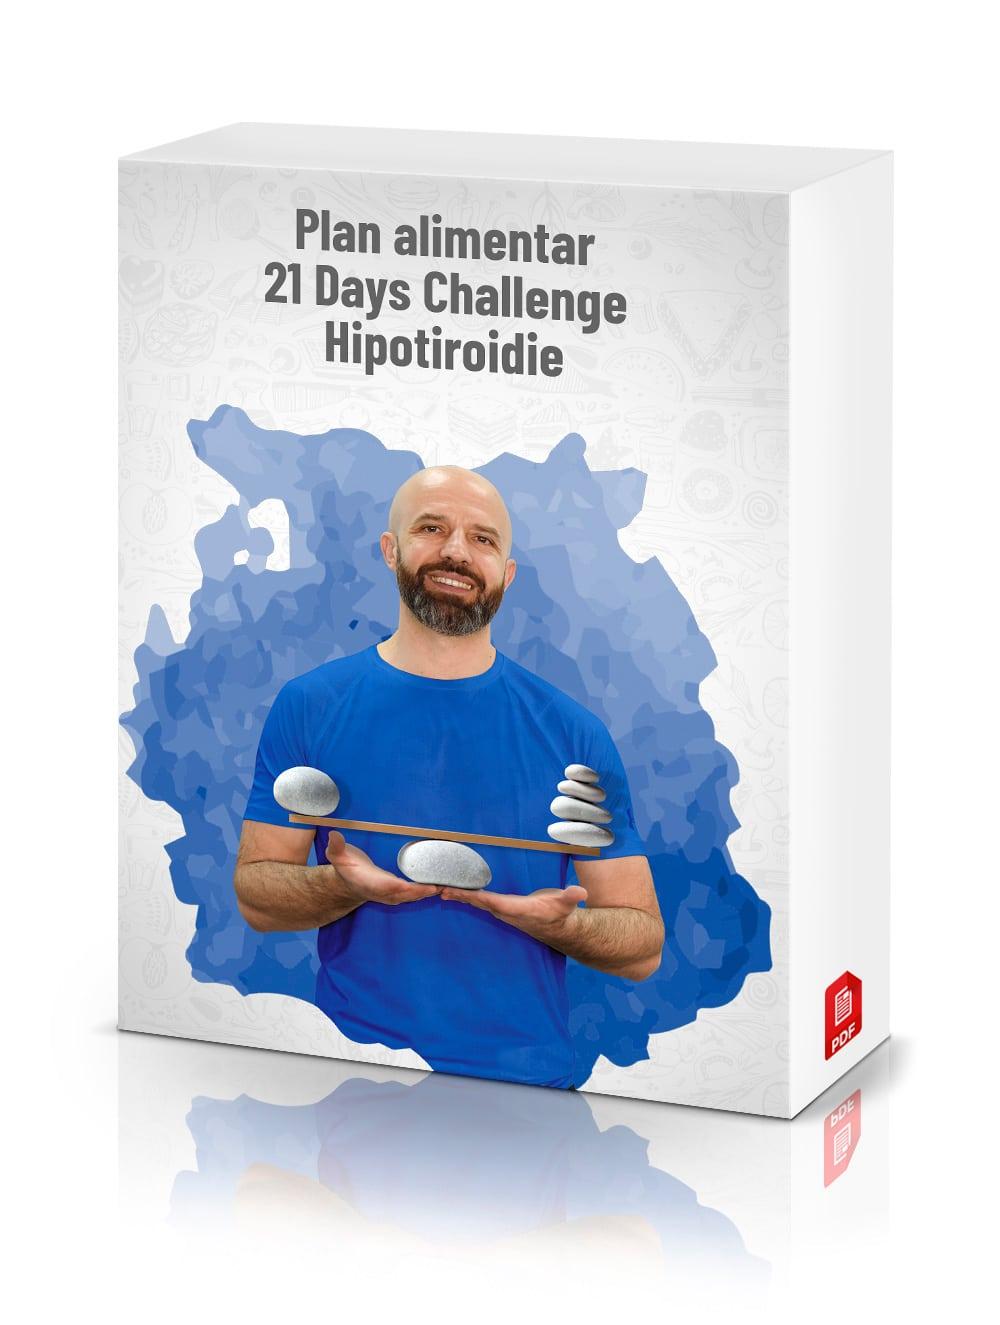 Plan alimentar 21 Days Challenge (HIPOTIROIDIE)